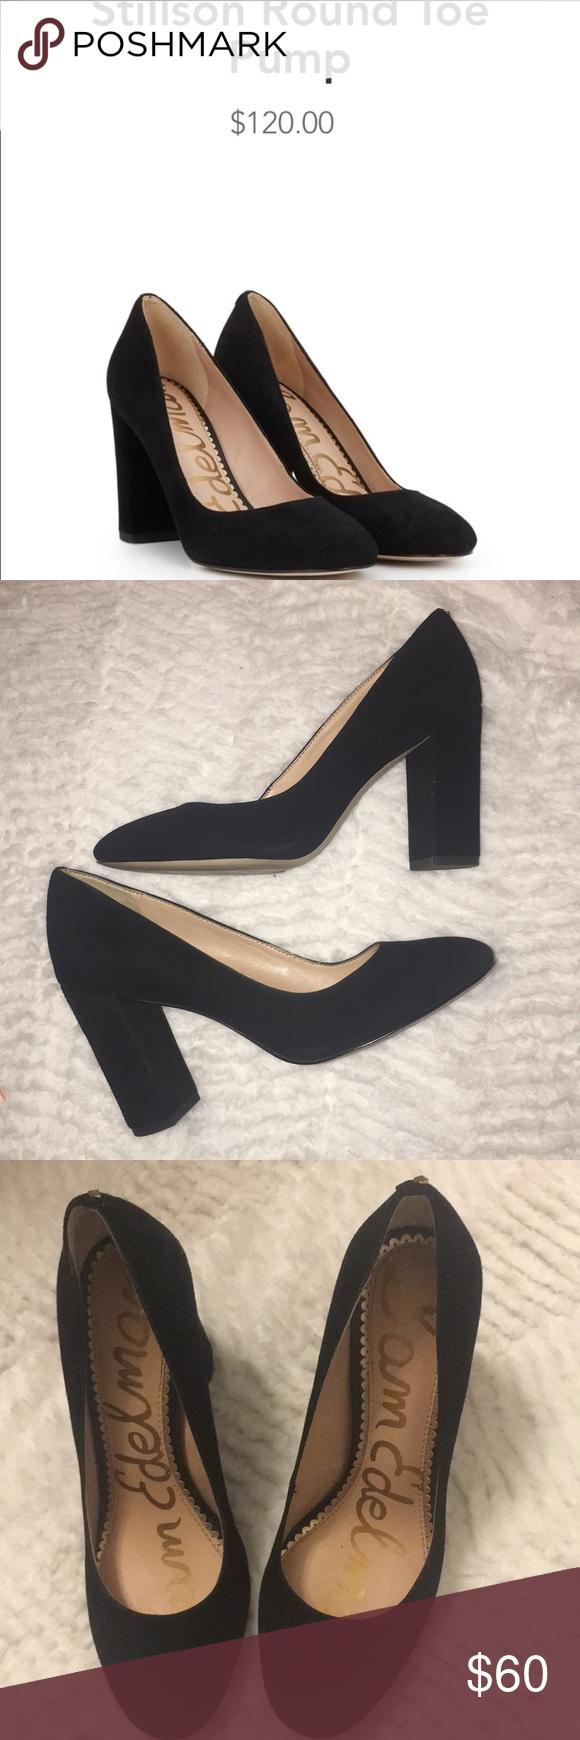 048d4f472ae9 Sam Edelman Stillson Black Suede heels size 6 Sam Edelman Stillson Black  Suede Round toe heel size 6. In preowned good condition. Sam Edelman Shoes  Heels